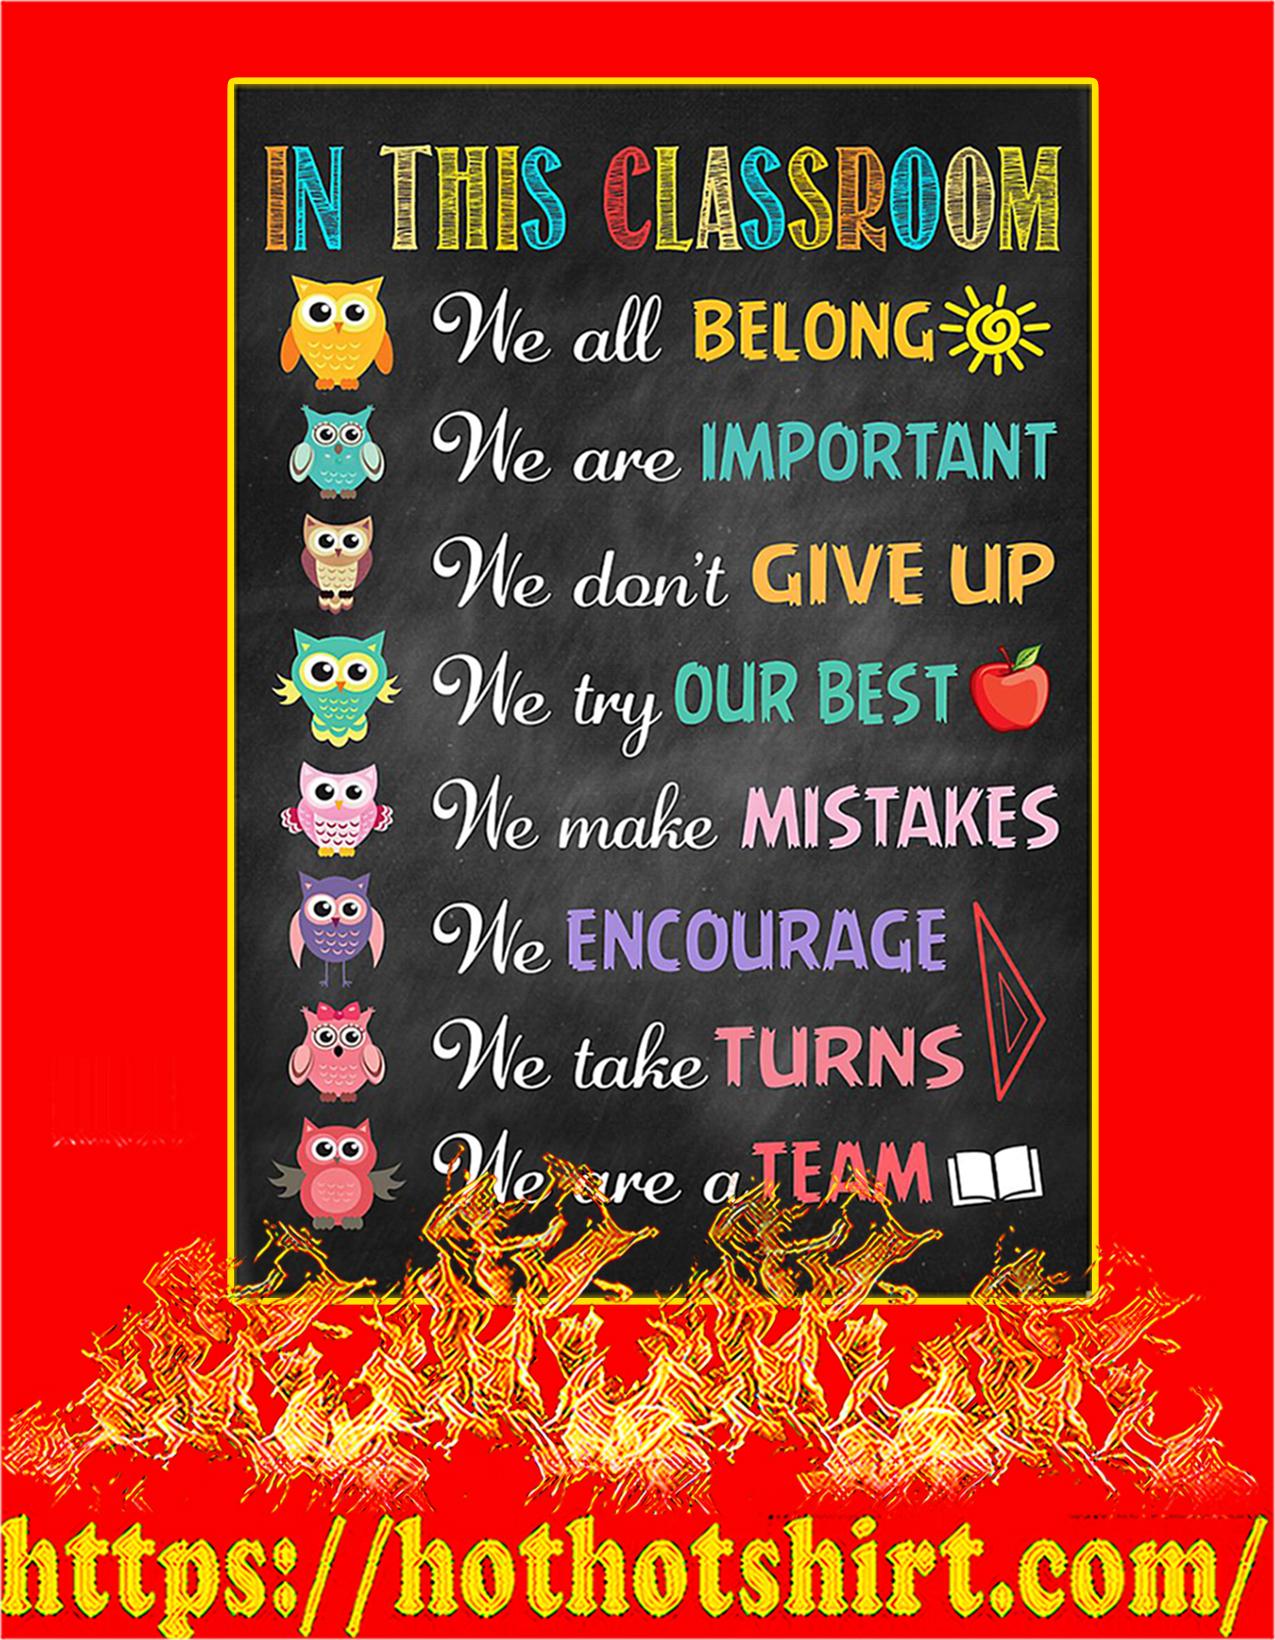 Owl teacher in this classroom we all belong poster - A2